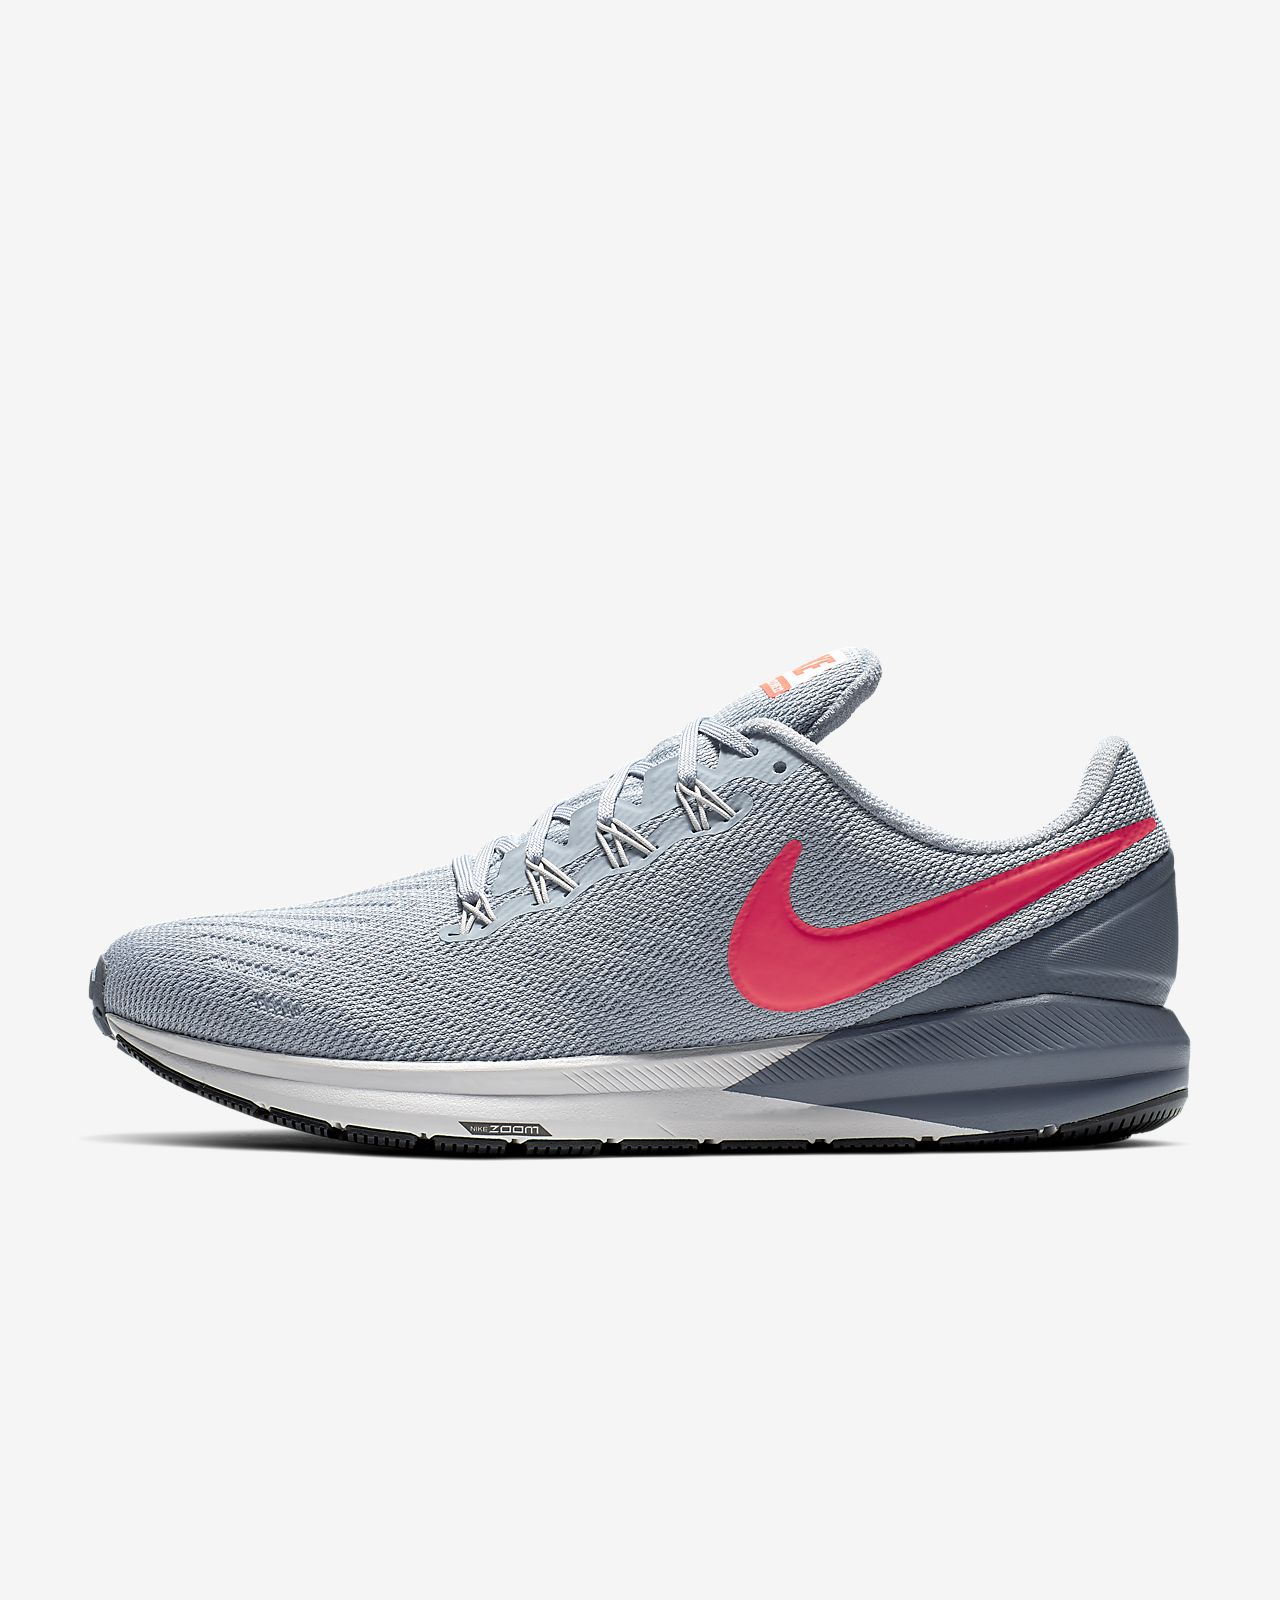 4c02e1d7 Мужские беговые кроссовки Nike Air Zoom Structure 22. Nike.com RU